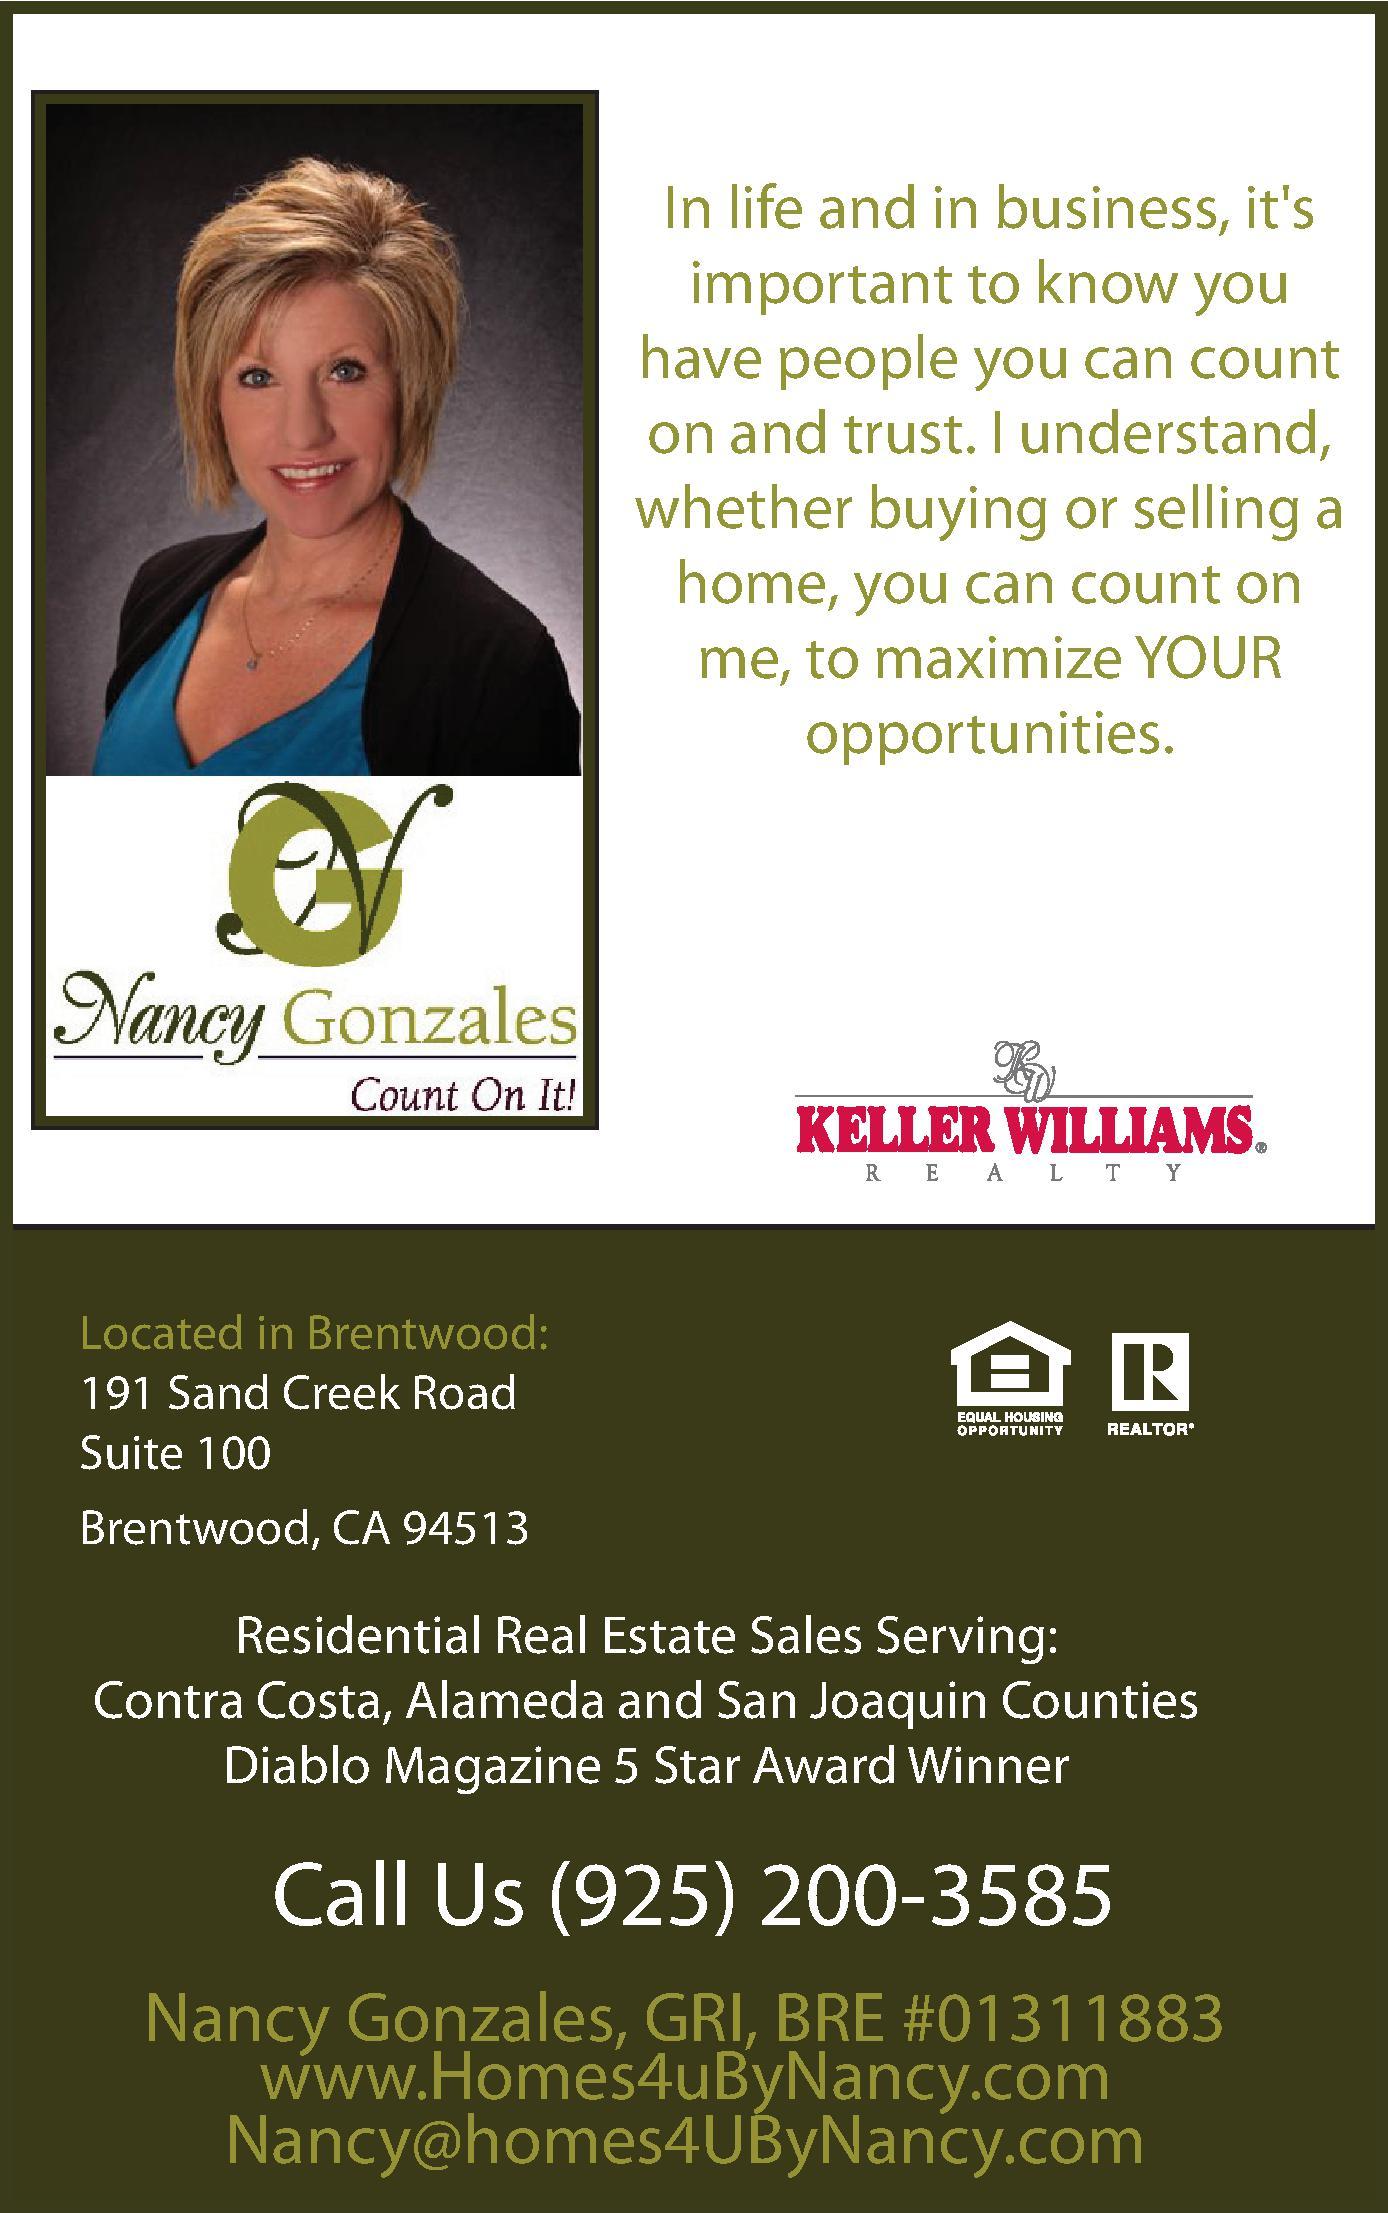 Keller Williams Realty East County - BRE #01311883